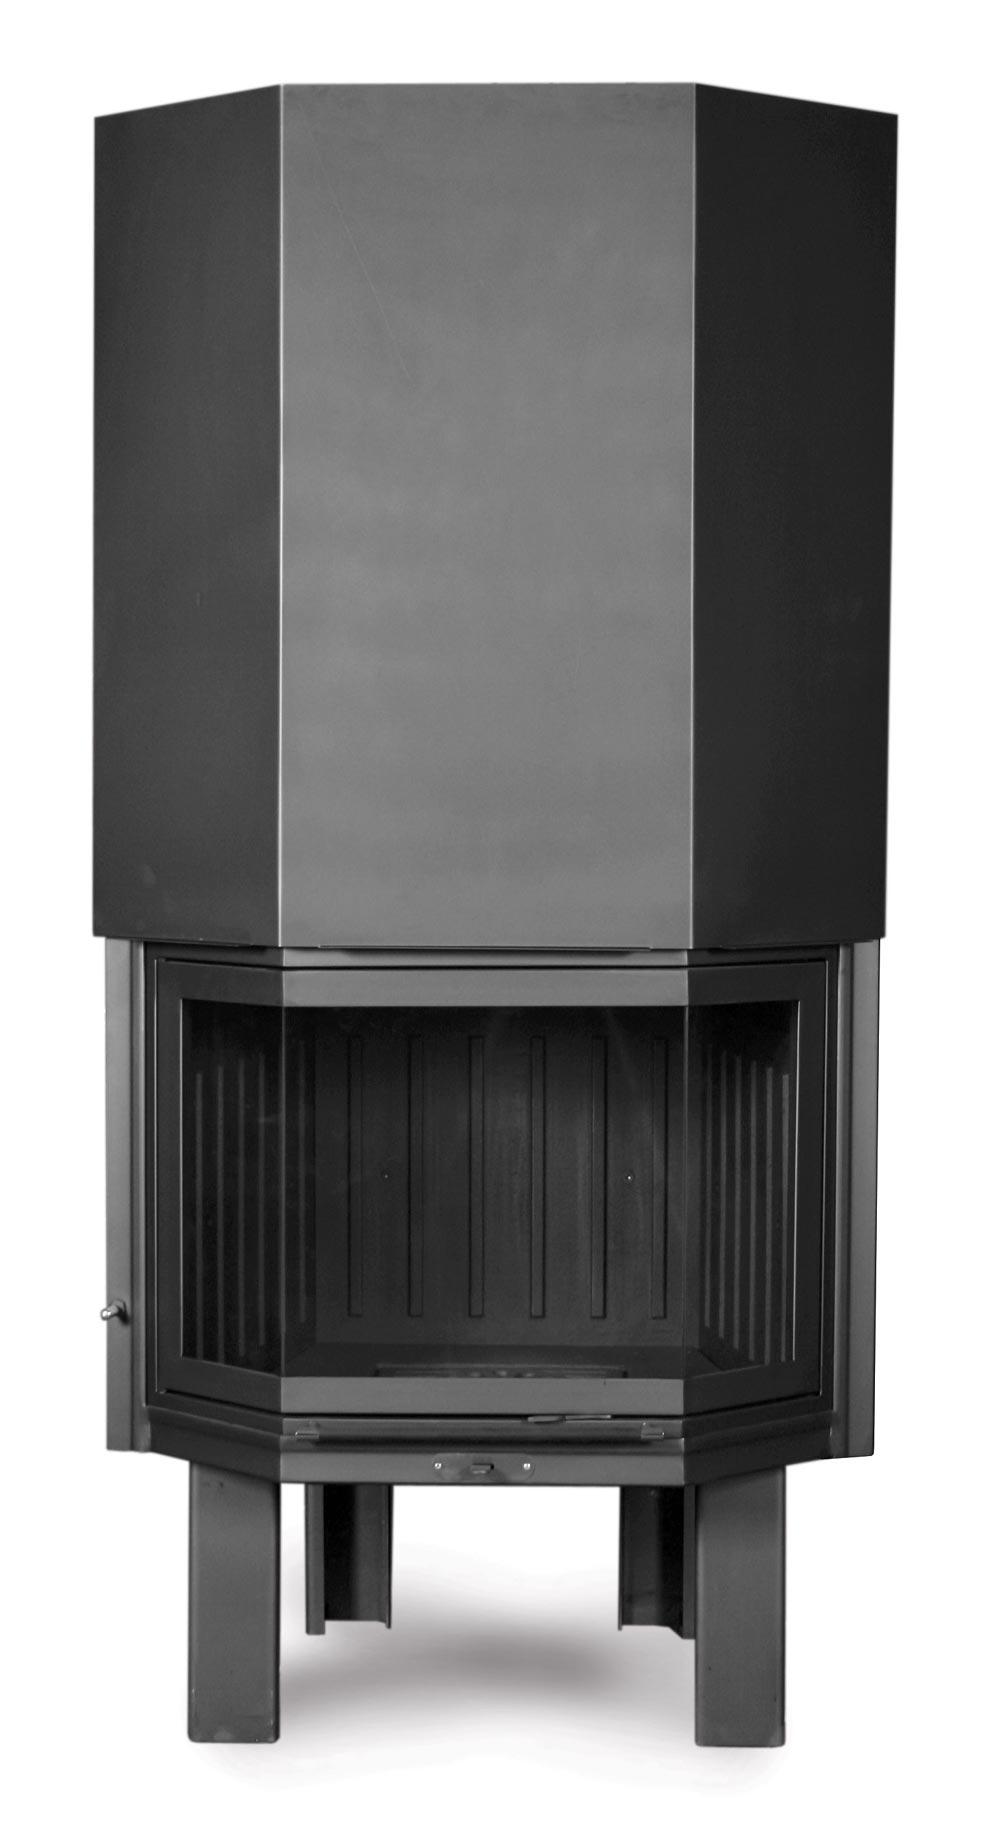 W-80-PD-POLIGONIKO-1z